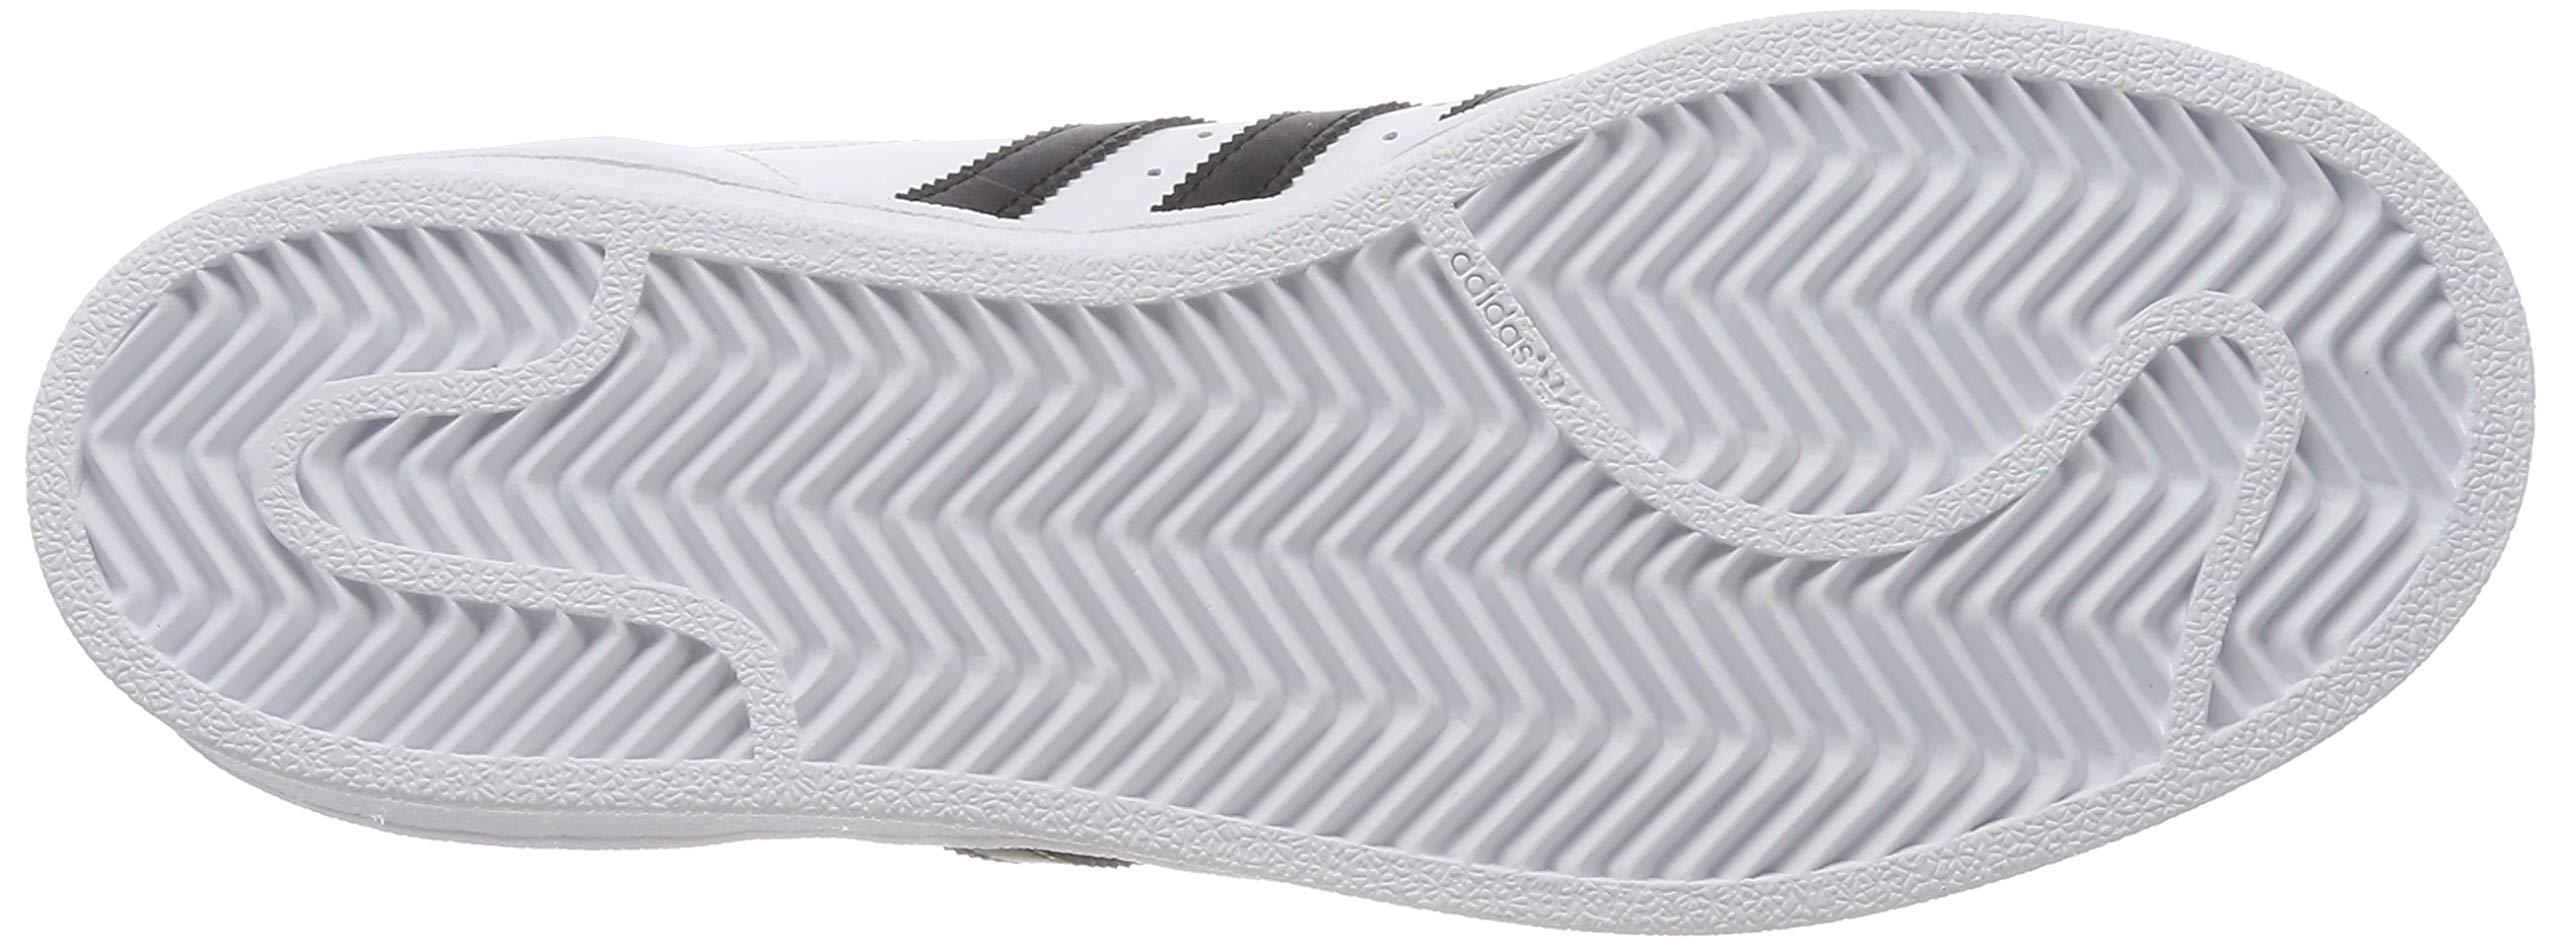 adidas Superstar J, Scarpe da Ginnastica Basse Unisex – Bambini 3 spesavip